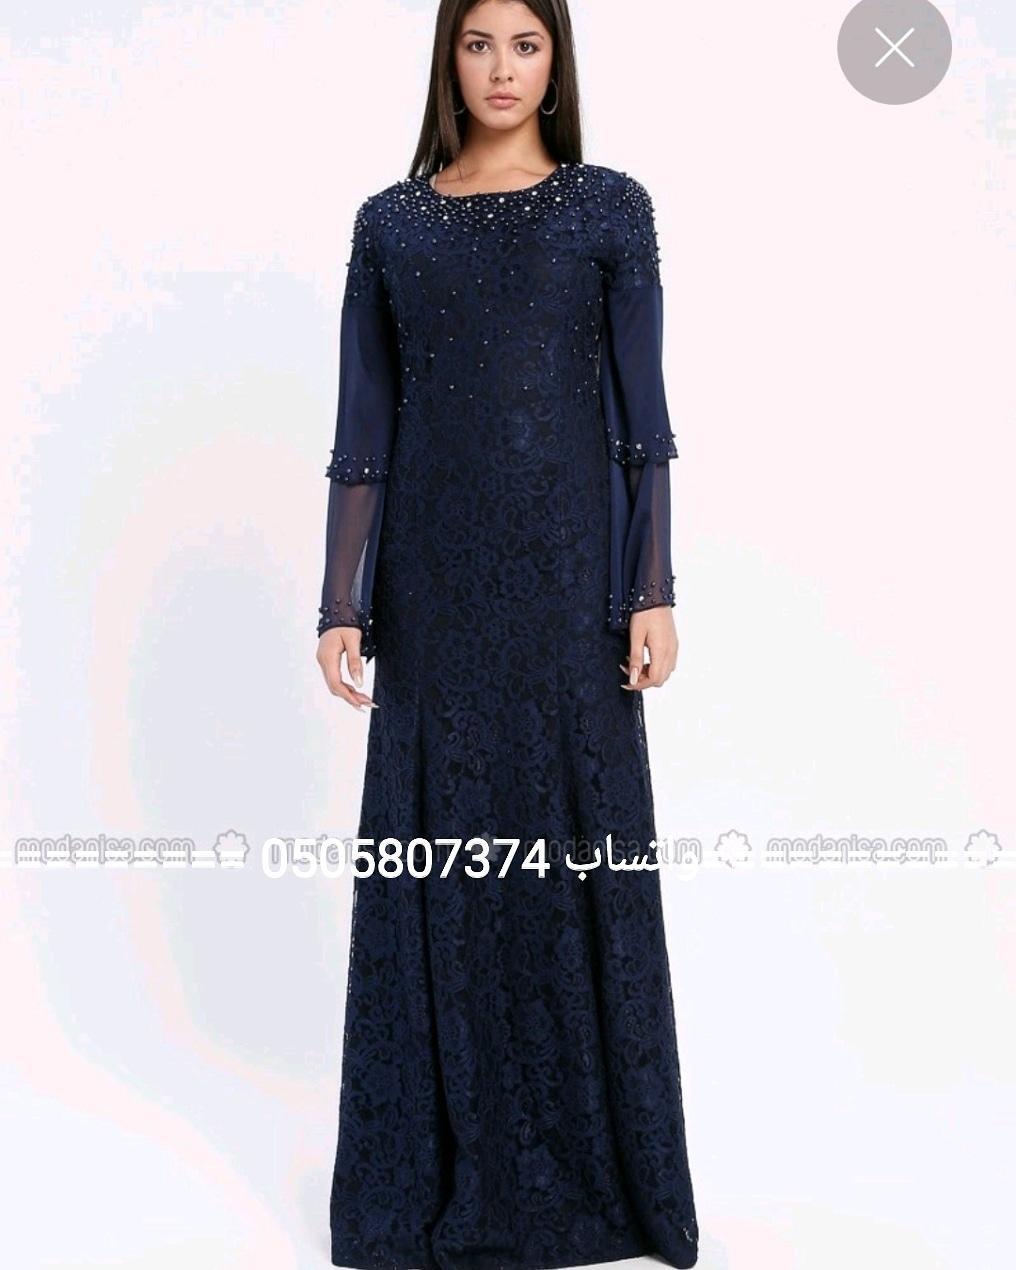 6d67b0d80 #ملابس #تخفيضات #مفاجأت #لك_سيدتي #تركي #الامارات #هدايا_حب# عروض#فساتين_  #موديلات_2018 #تونيك #ابوظبي #عجمان #راس الخيمة#دبي #الشارقة # الفجيرة  #السعوديات ...